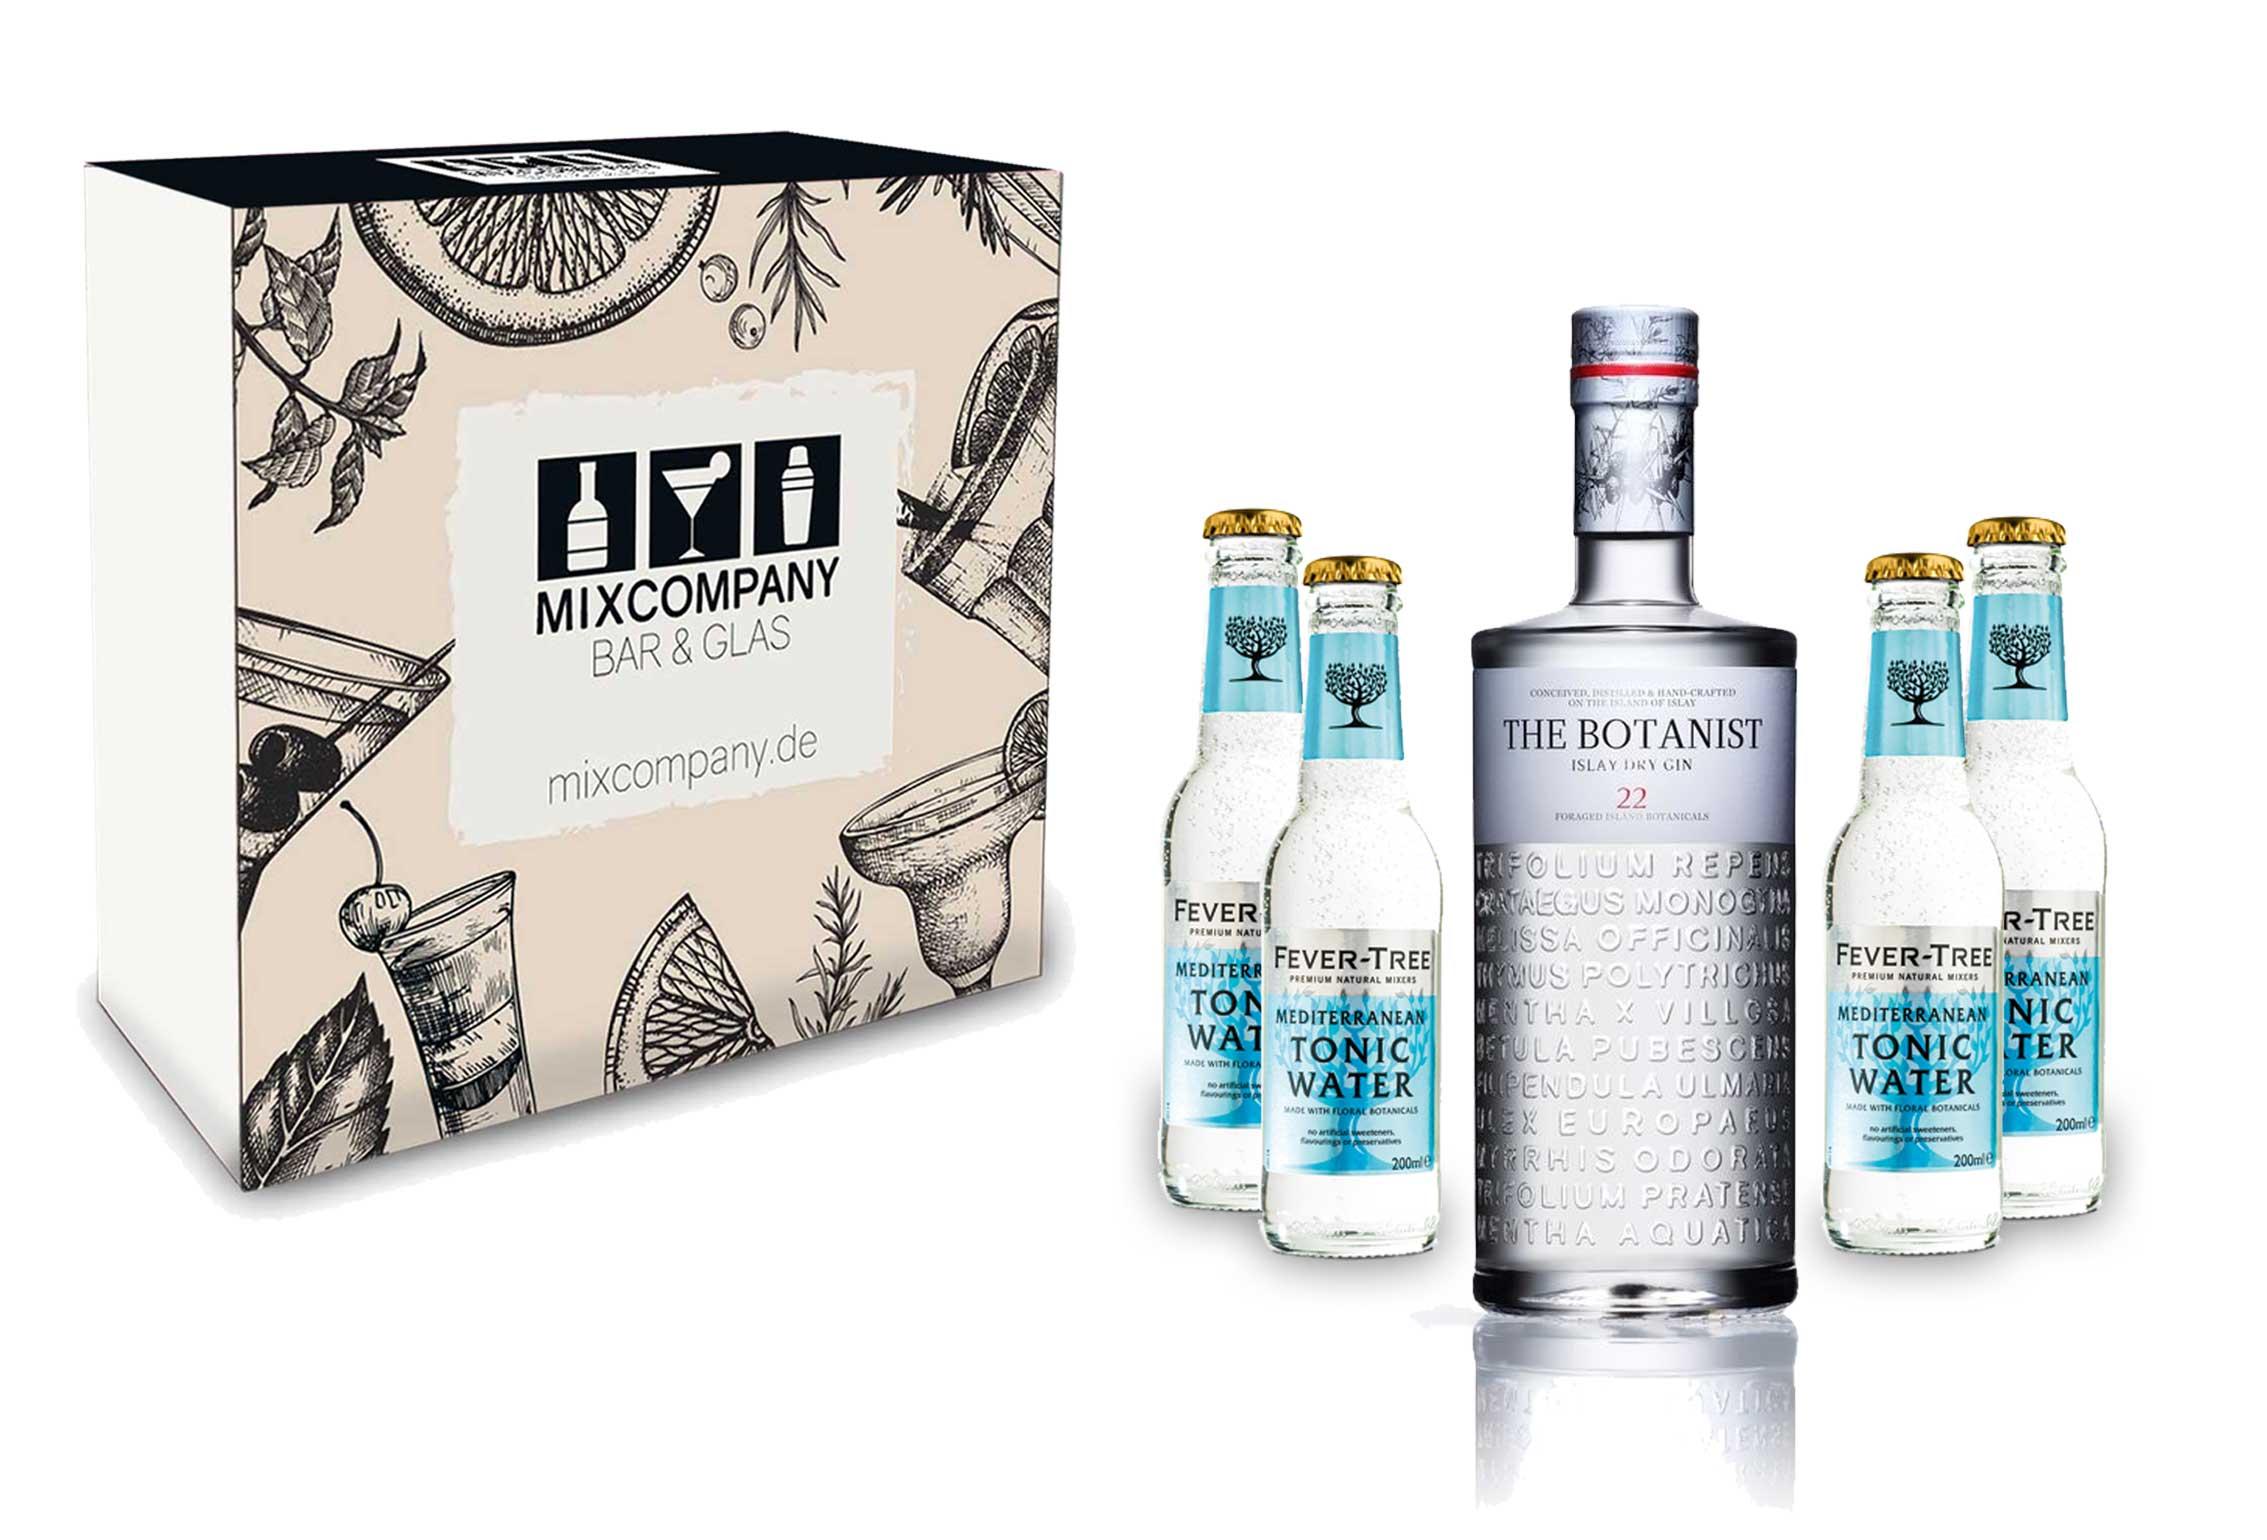 Gin Tonic Giftbox Geschenkset - The Botanist Islay Dry Gin 0,7l 700ml (46% Vol) + 4x Fever Tree Mediterranean Tonic Water 200ml inkl. Pfand MEHRWEG + Geschenkverpackung